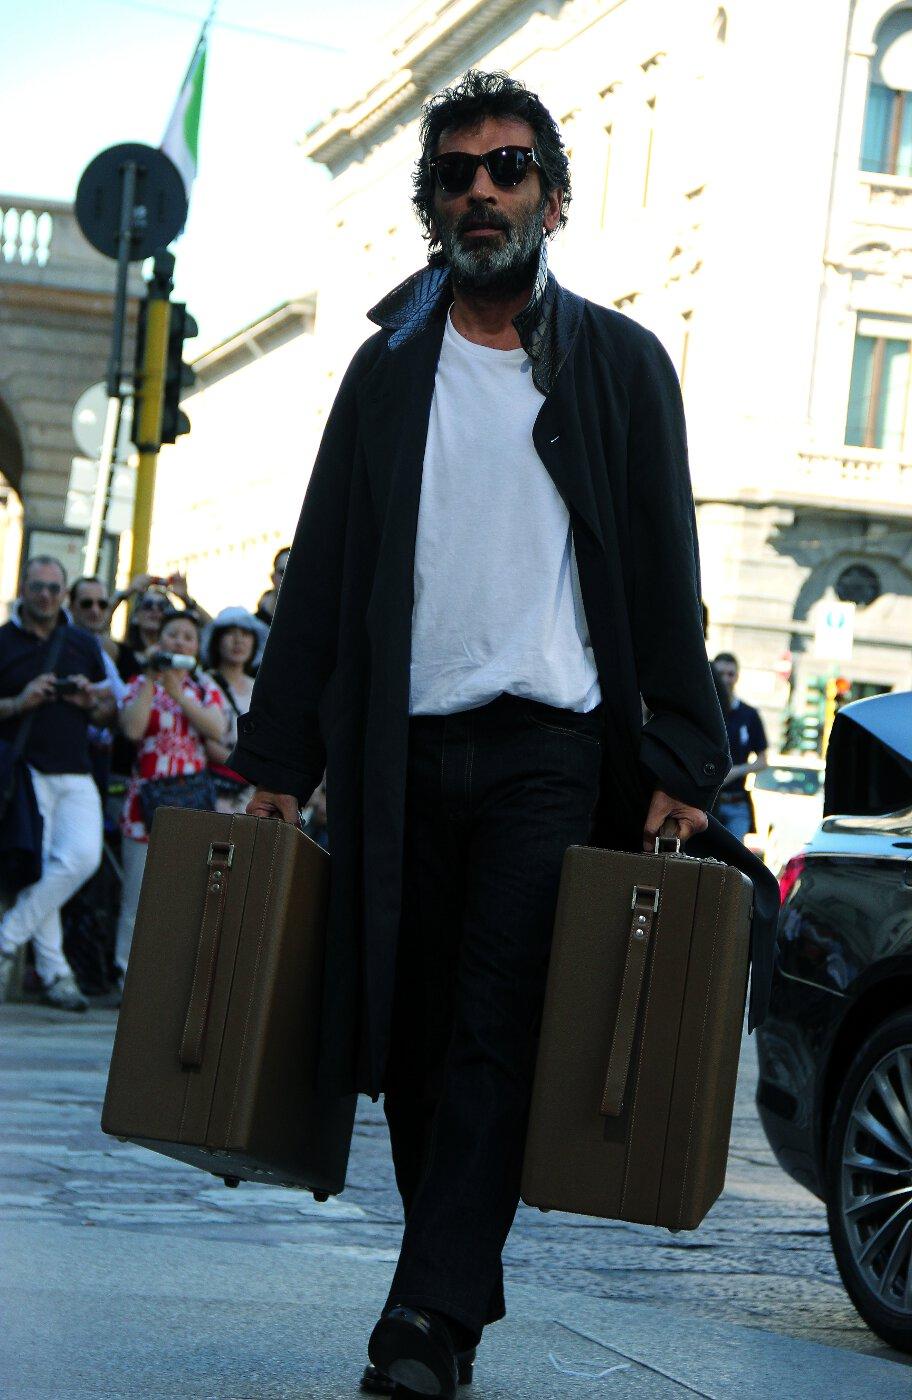 trussardi-spring-summer-2012-men-collection-milano-fashion-week-2012-trussardi-primavera-estate-catwalk-2012